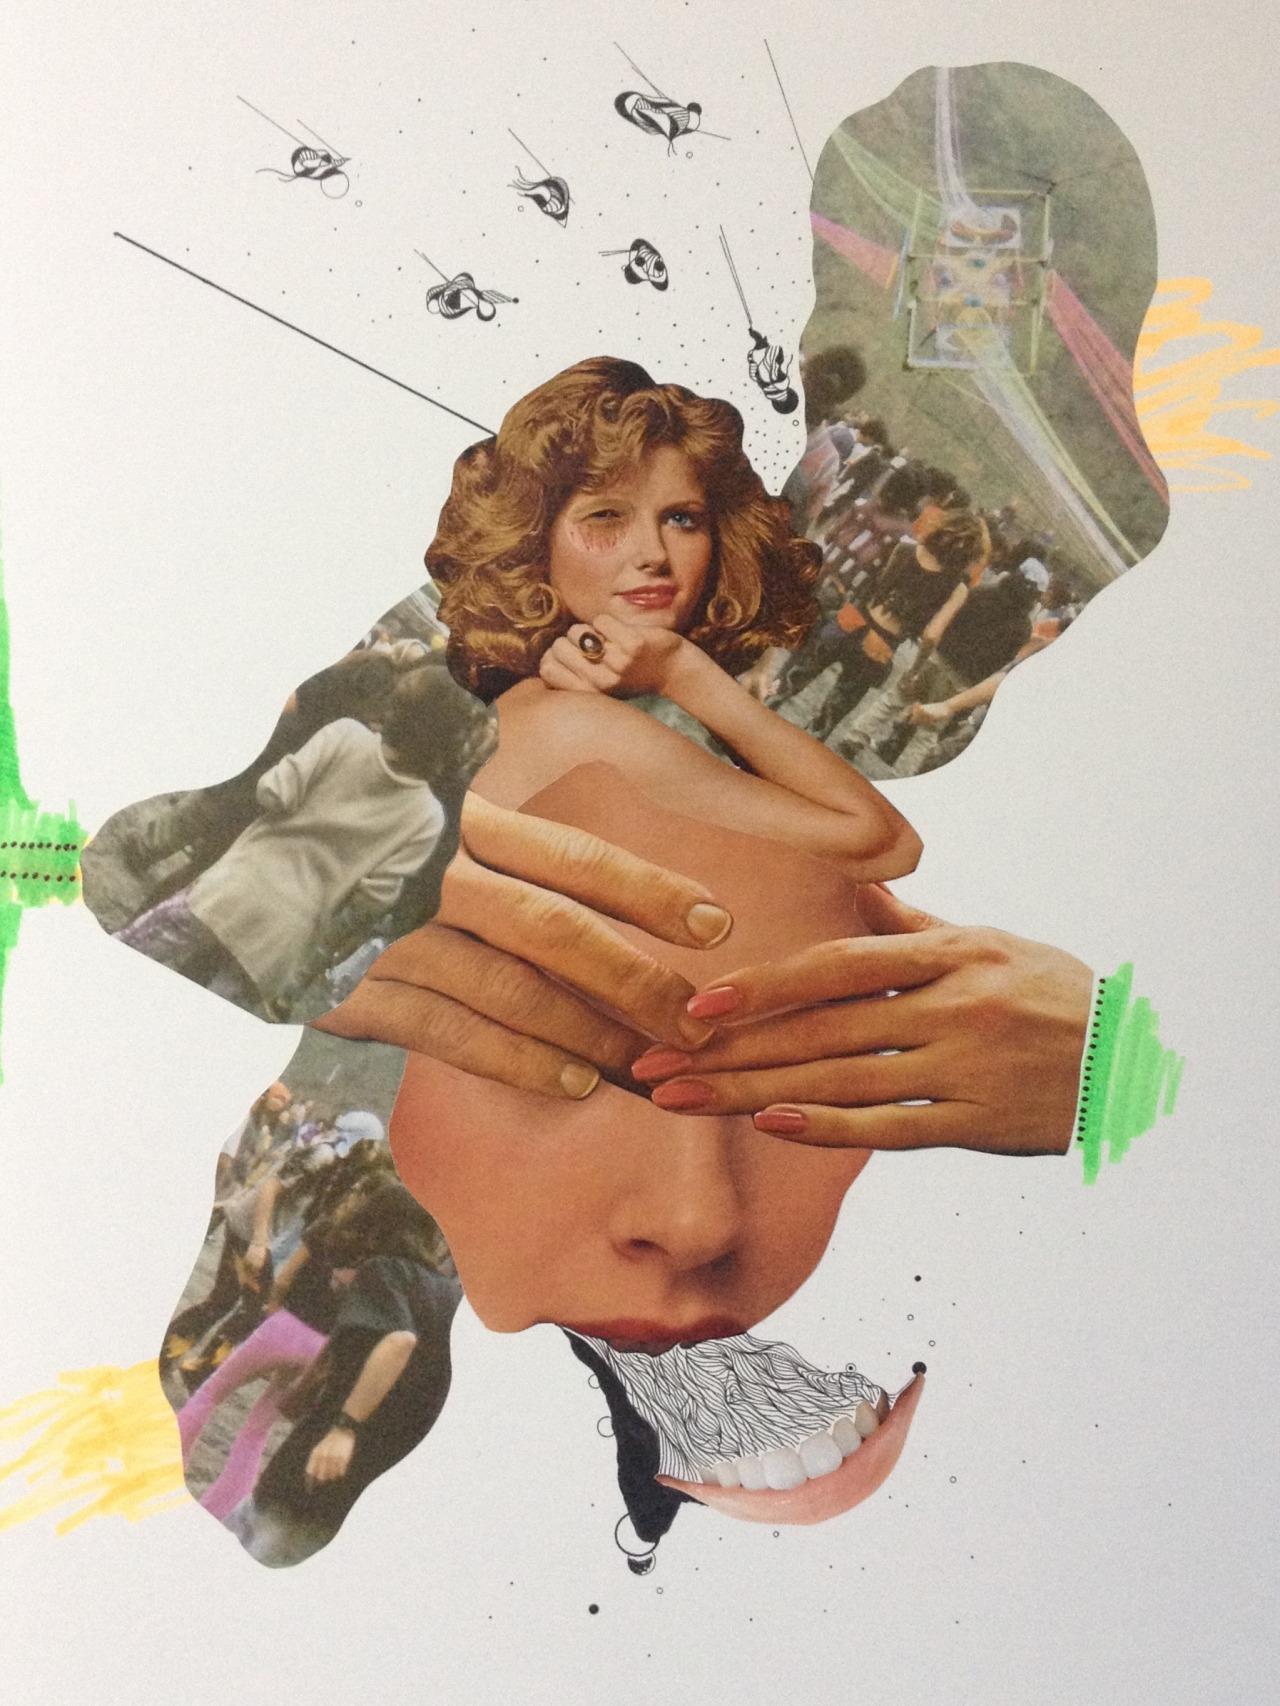 Collaboration #47 More Work From Eiji Nasu & John Vochatzer: nsejnsej.tumblr.com johnvochatzer.tumblr.com facebook.com/artofjohnvochatzer instagram: @nsejnsej @calamityfair